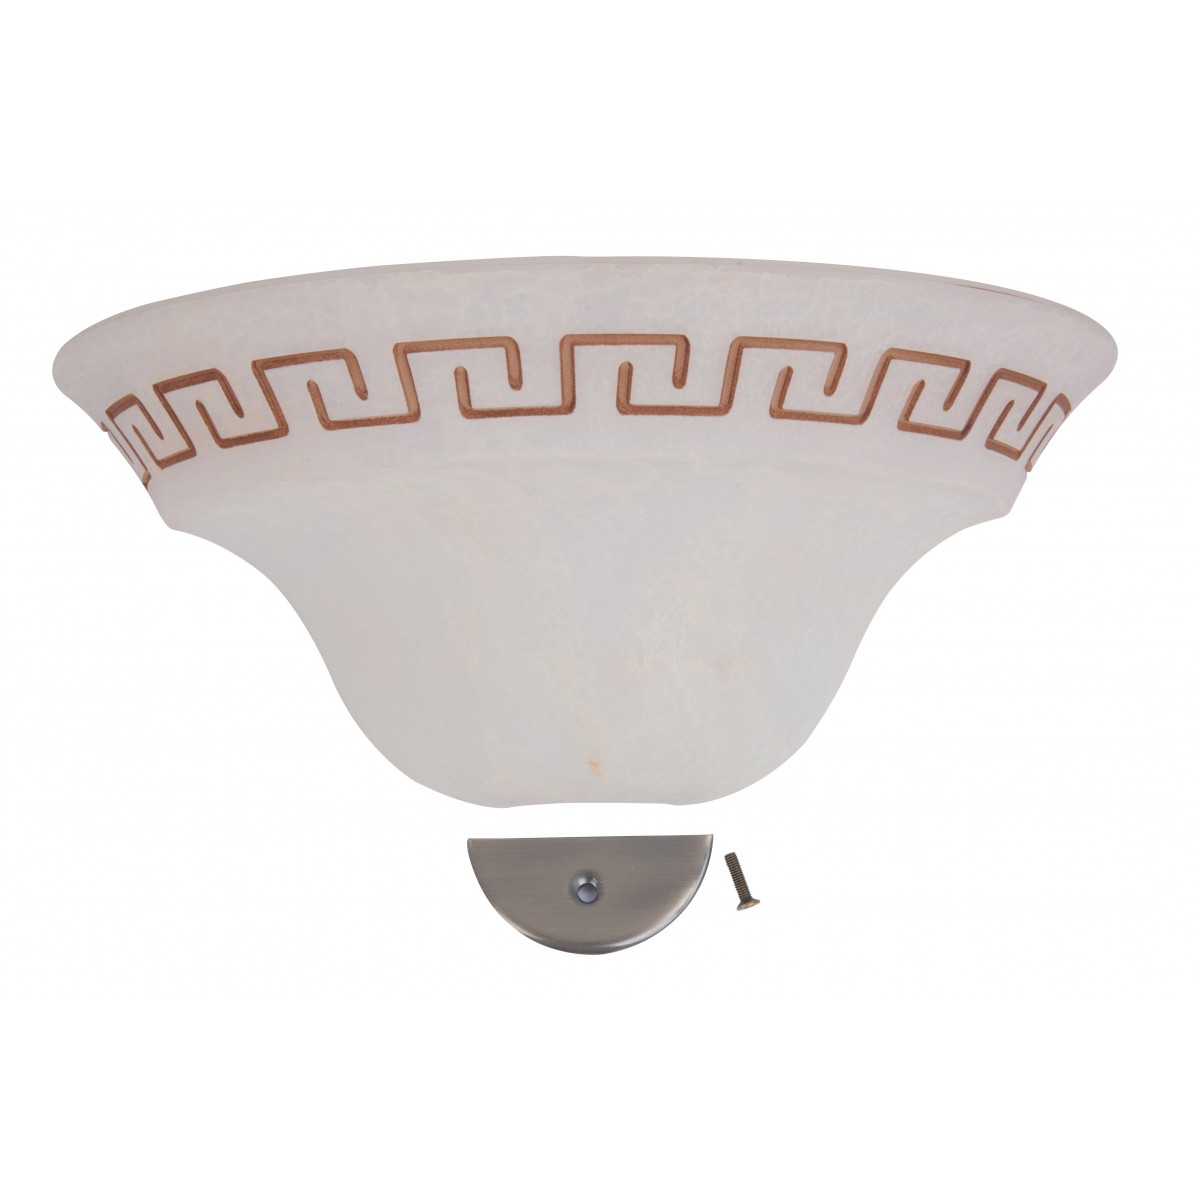 3003004307141 - Verre d'applique antique avec Greca